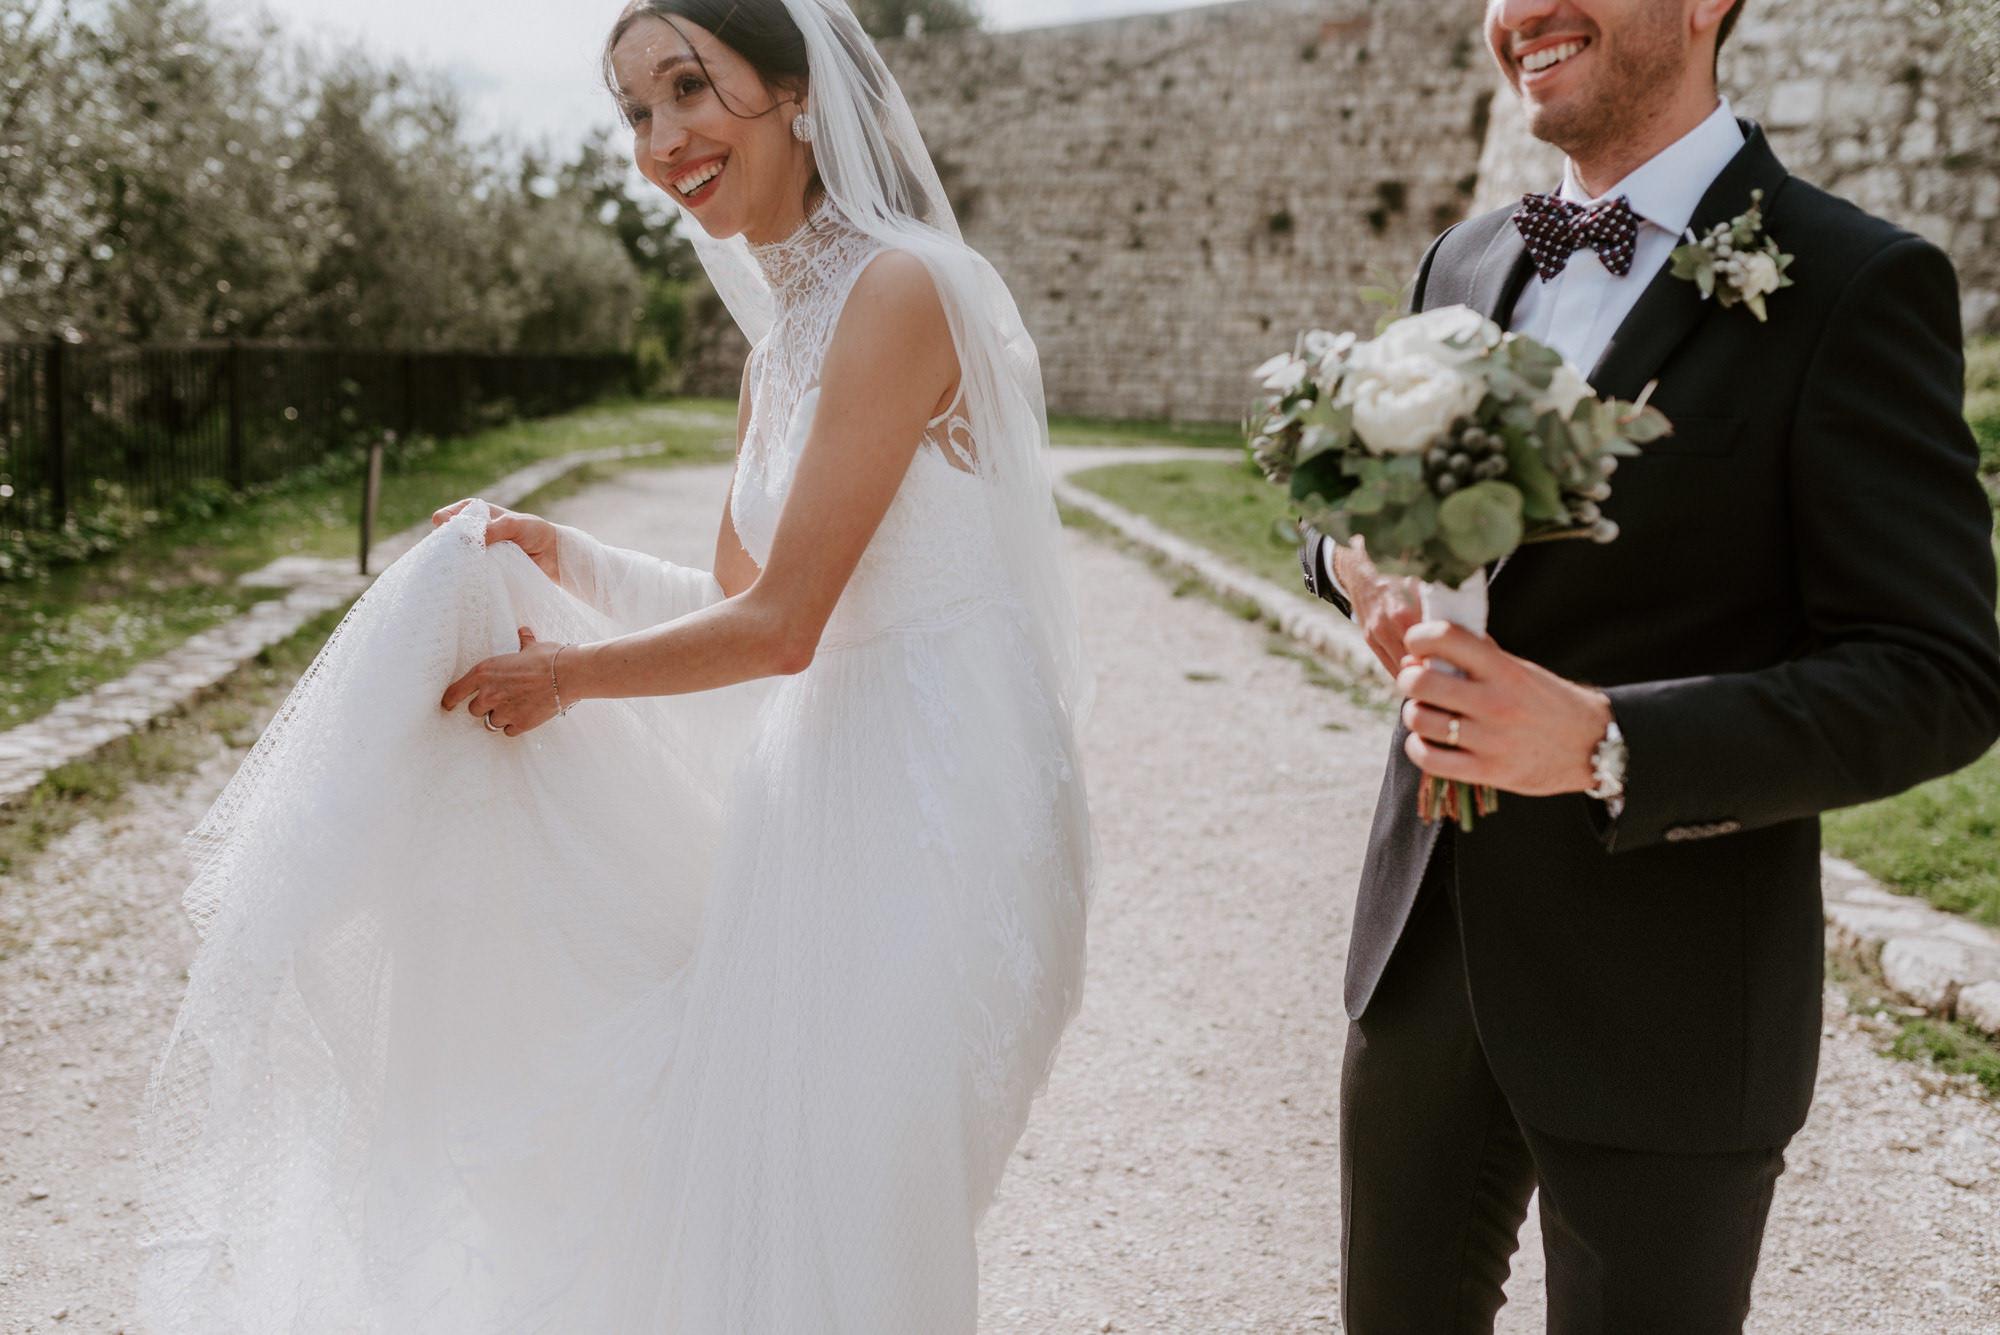 FOTO+PHOTO+BODA+WEDDING+ITALIA+ITALY+MAURICIO+GARAY+MAURICIOGARAY+WEDDINPHOTOGRAPHER+FOTOGRAFODEBODA-1241.jpg